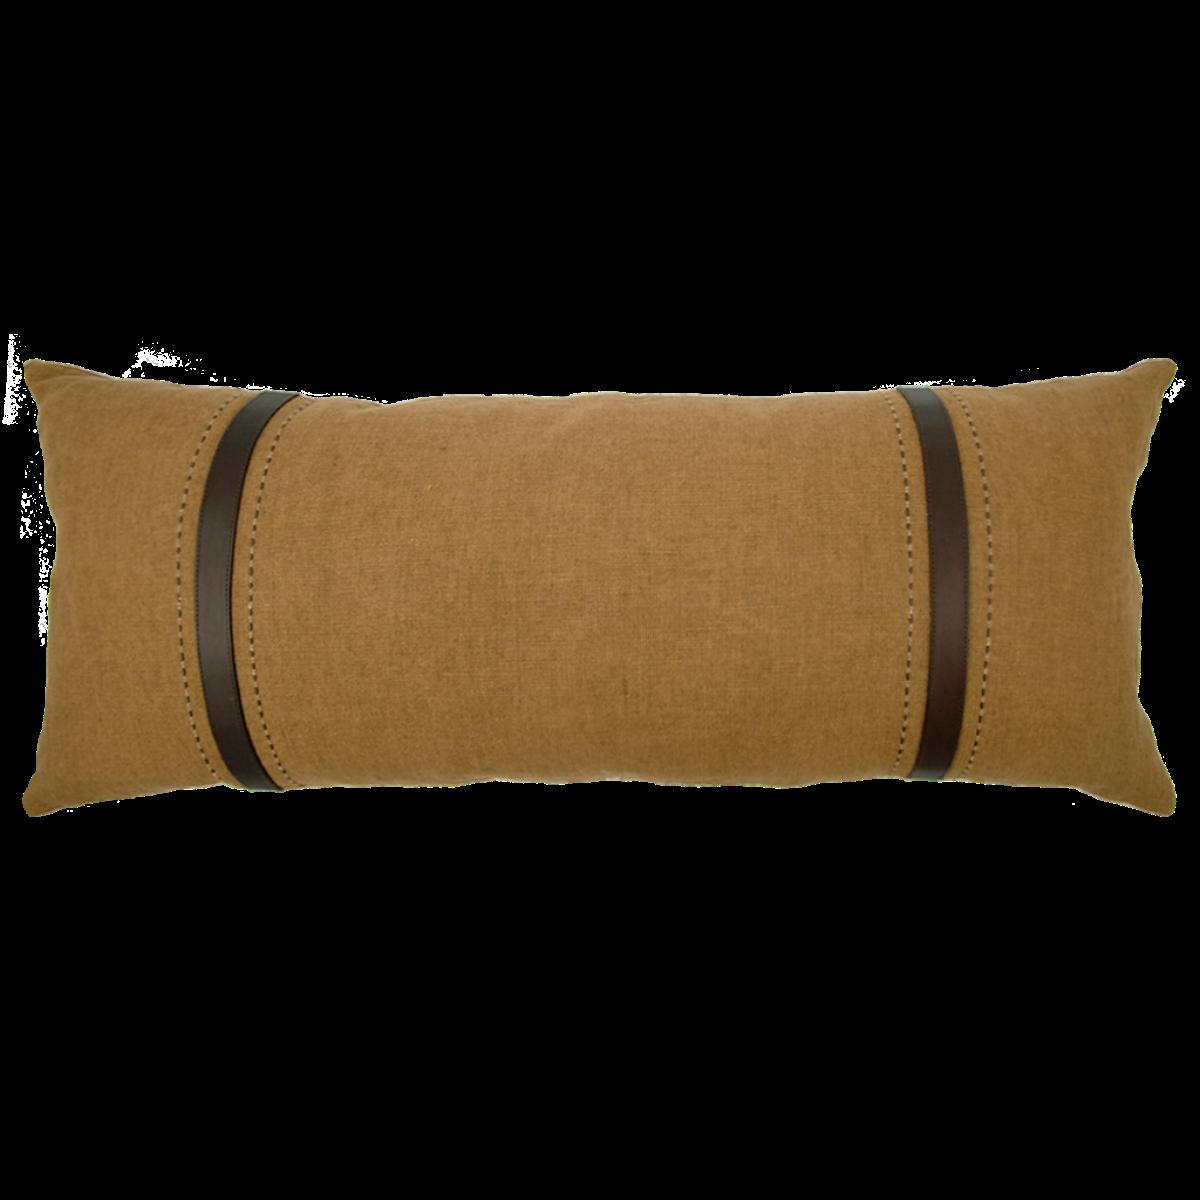 de Le Cuona | Bracken Sofa Cushion With Leather Straps Clay